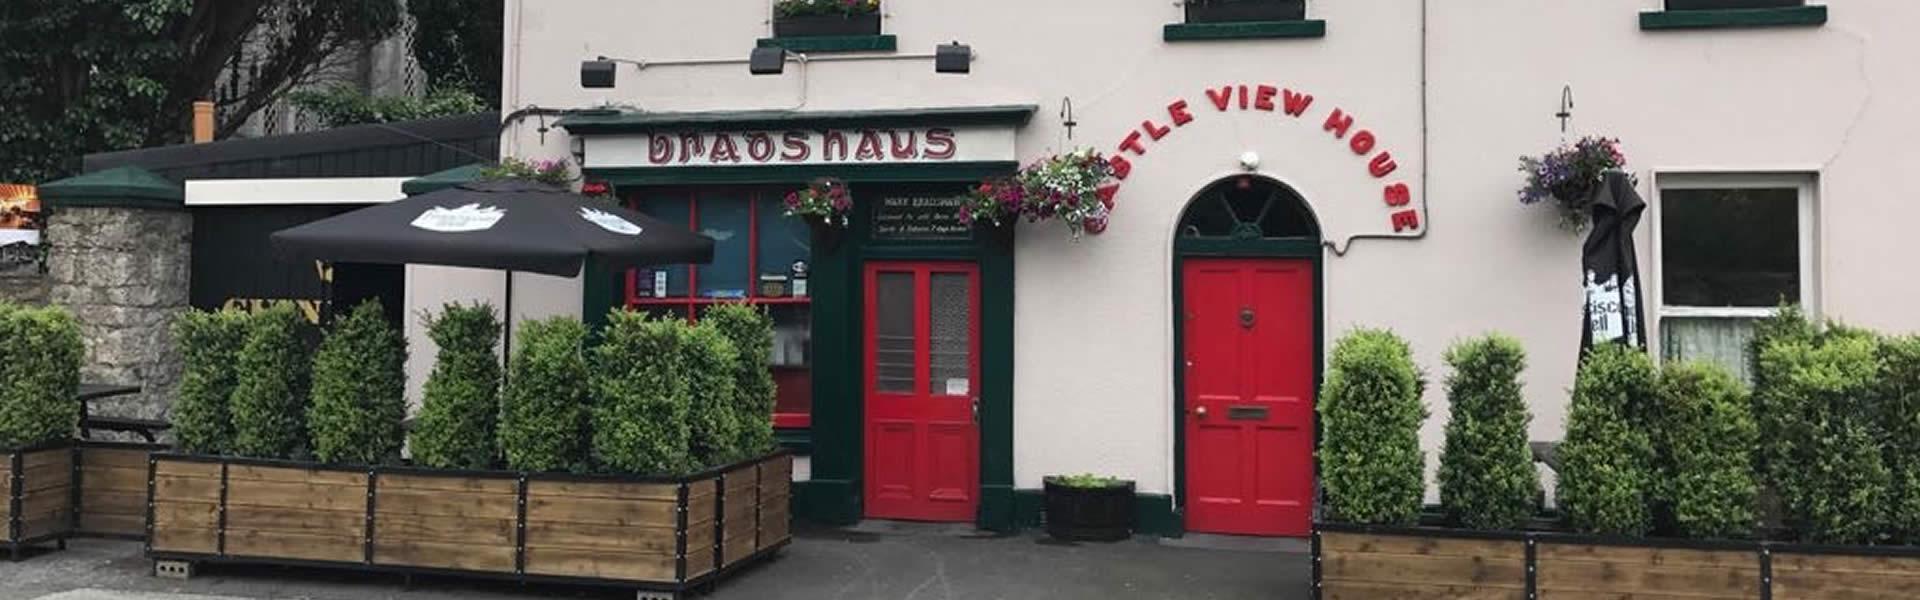 Bradshaw's Bar in Castleconnell